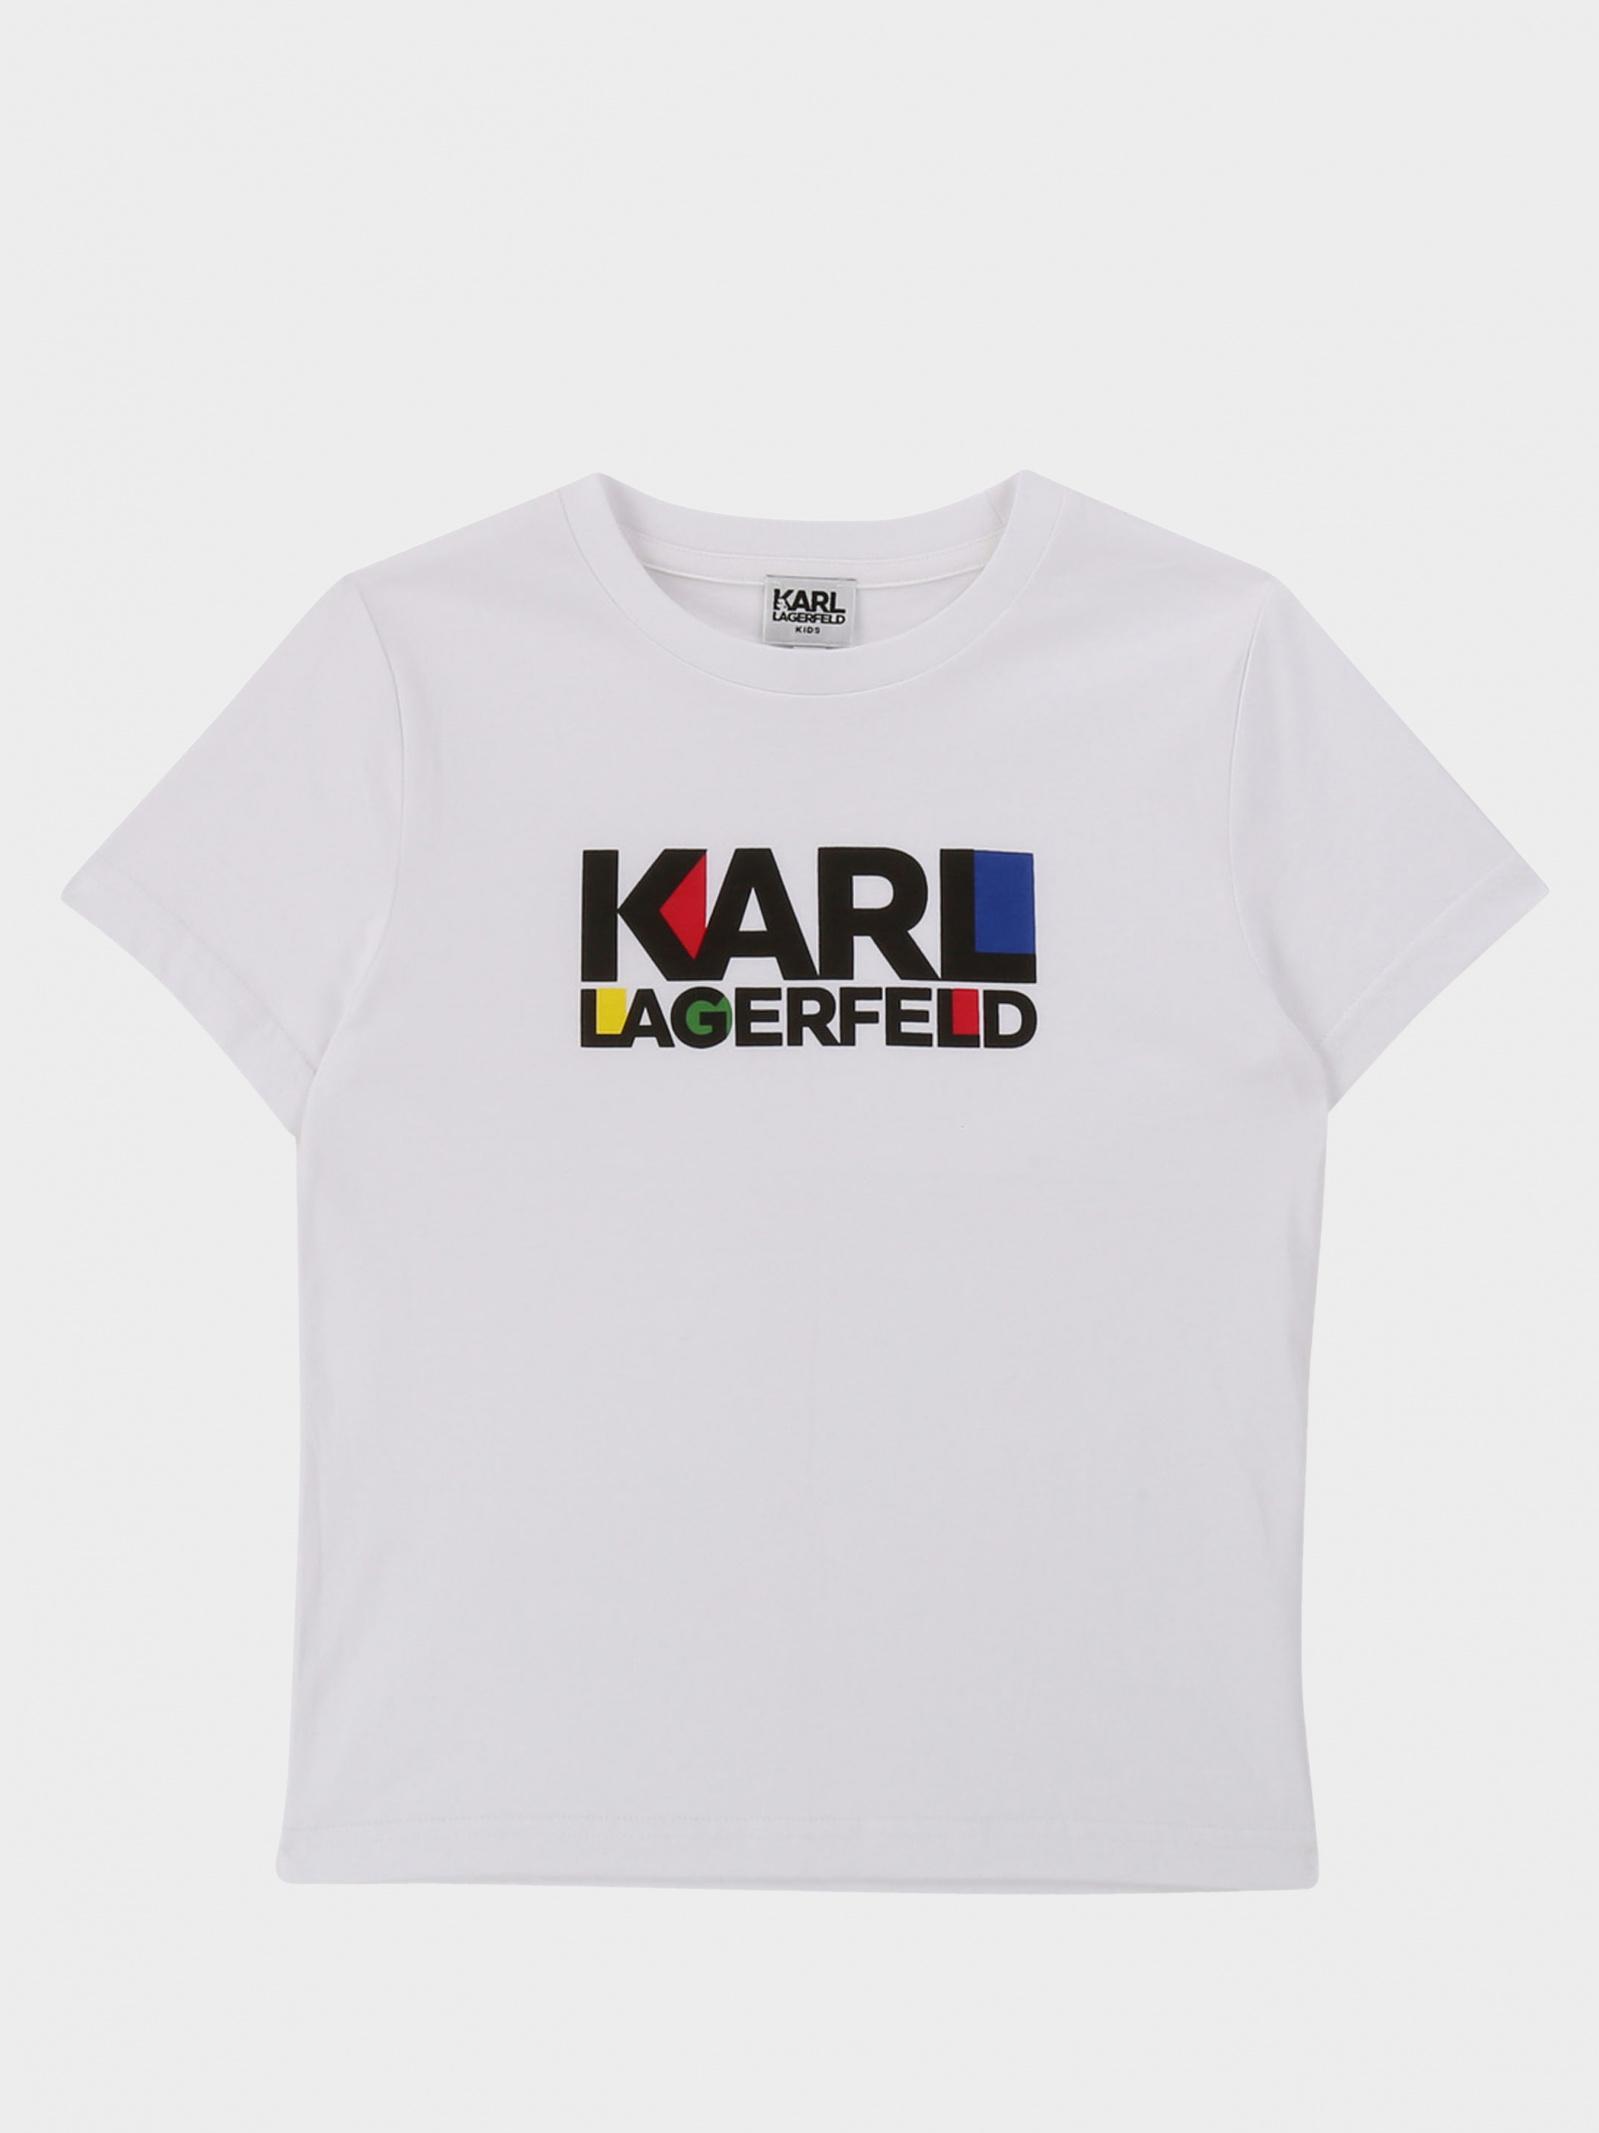 Футболка детские KARL LAGERFELD модель HR278 отзывы, 2017